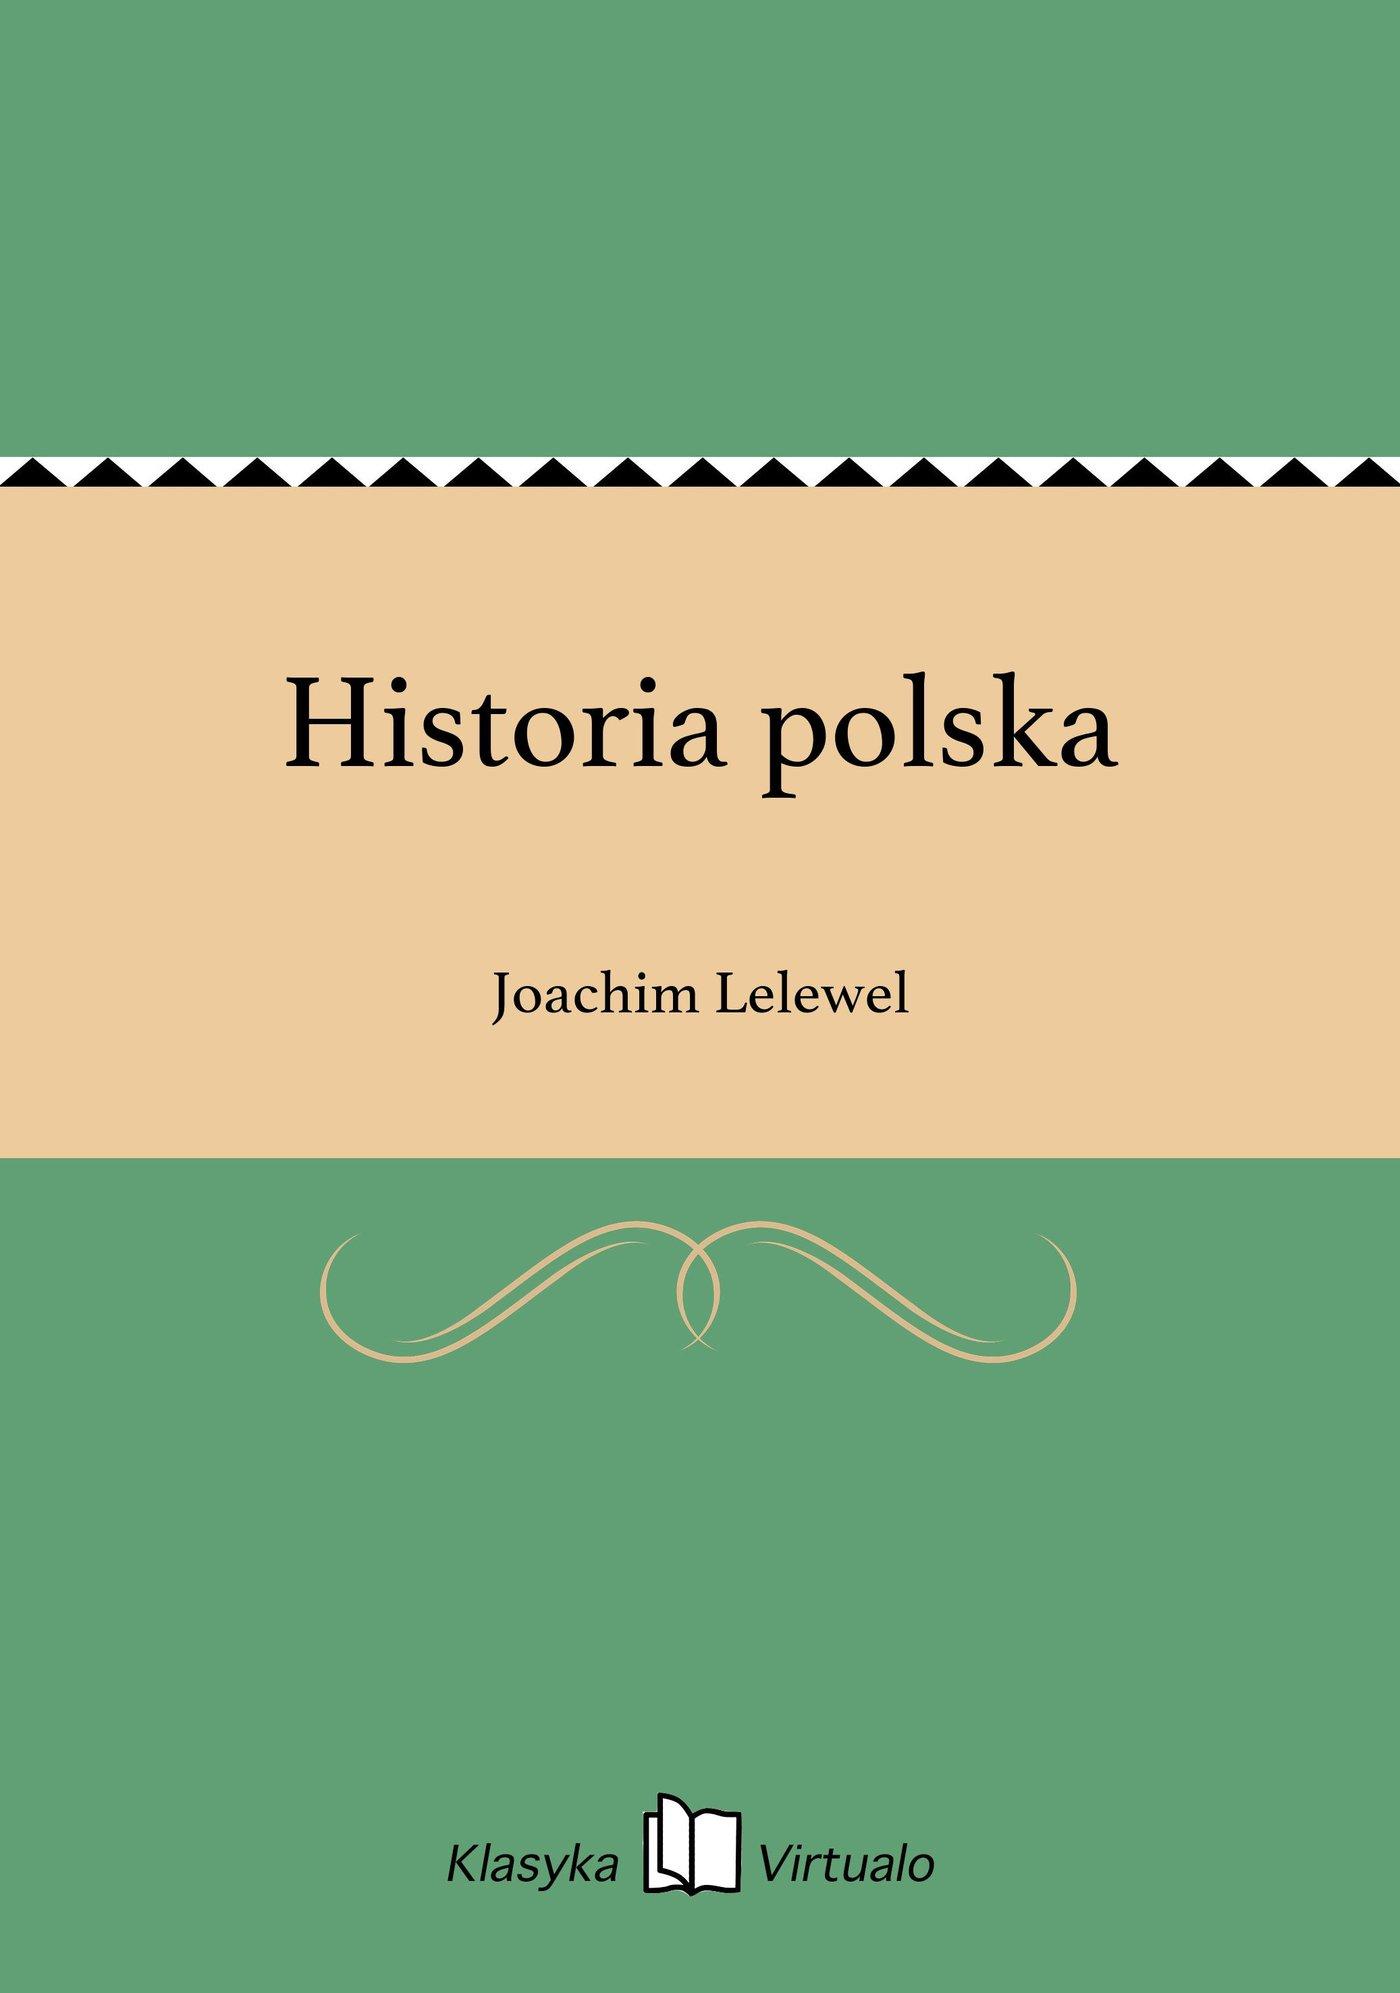 Historia polska - Ebook (Książka na Kindle) do pobrania w formacie MOBI